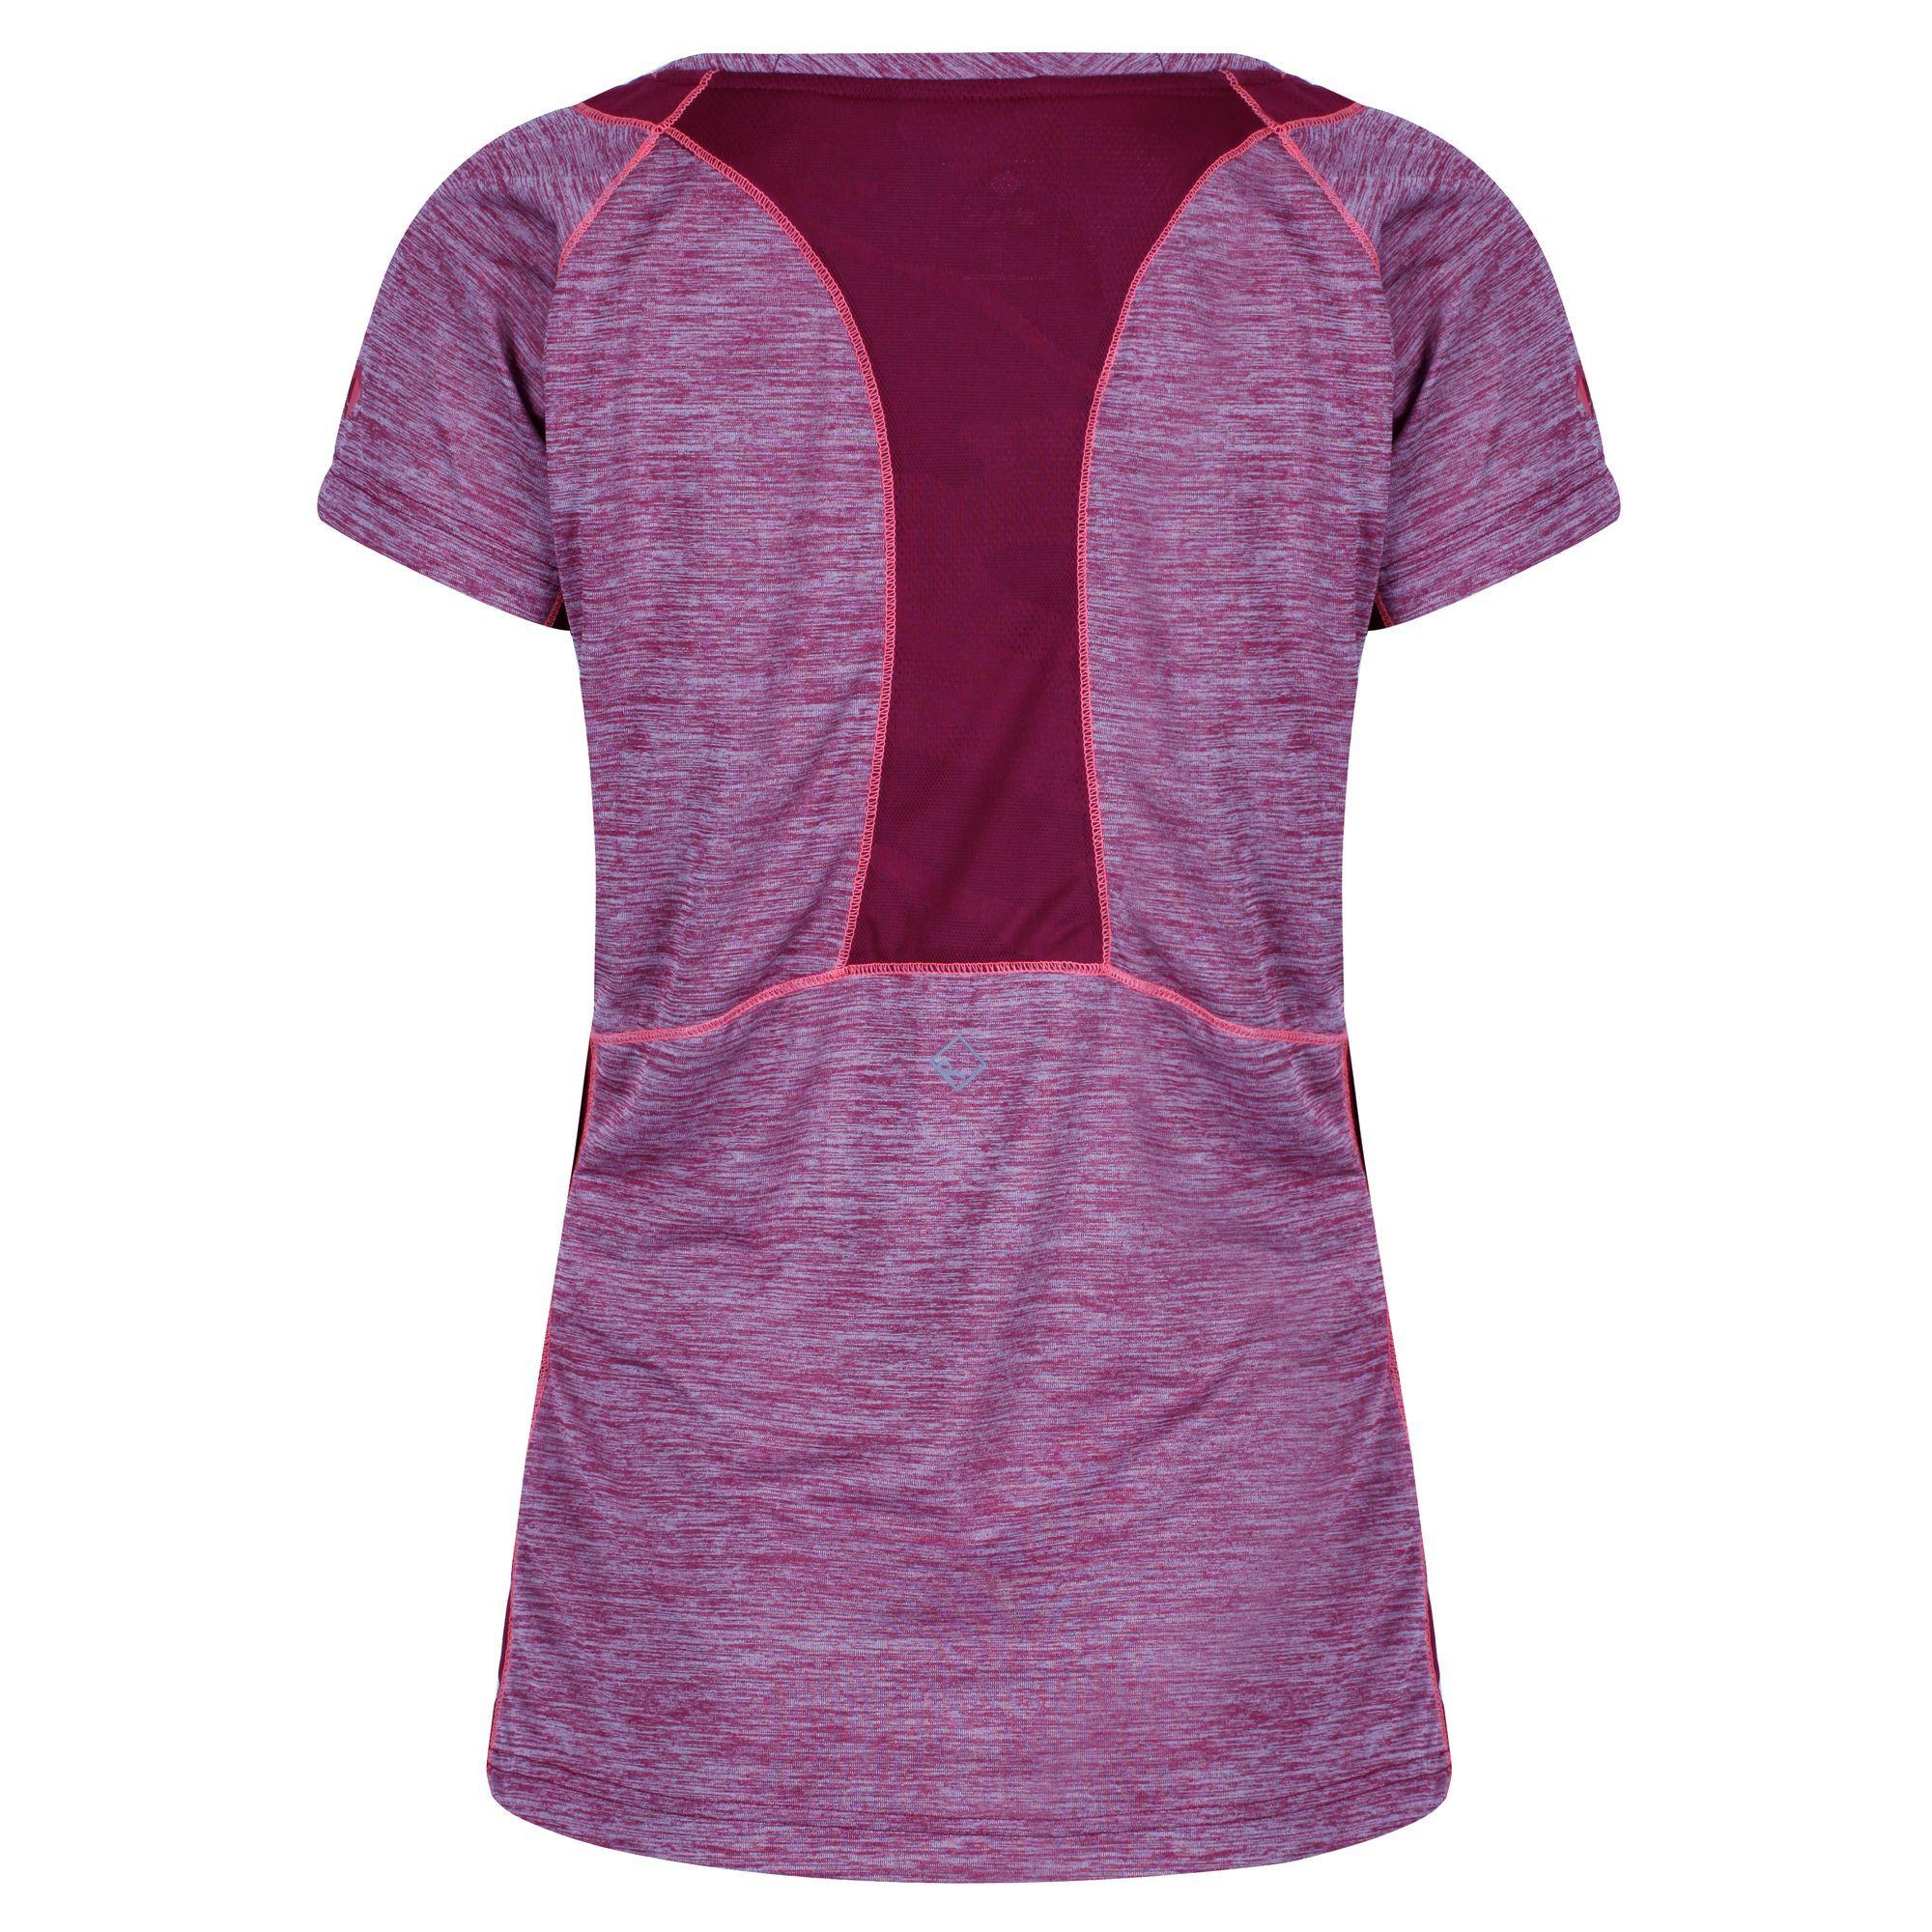 Regatta Womens/Ladies Breakbar IV Breathable T-Shirt